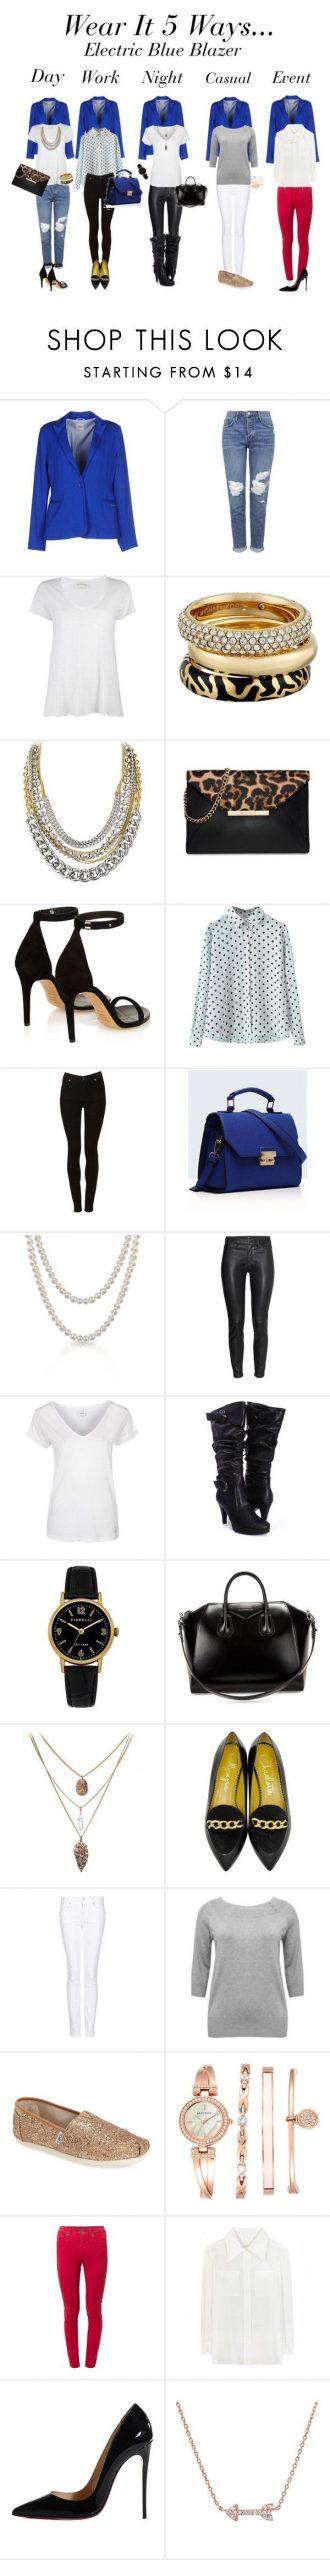 Wear it 5 Ways: Electric Blue Blazer